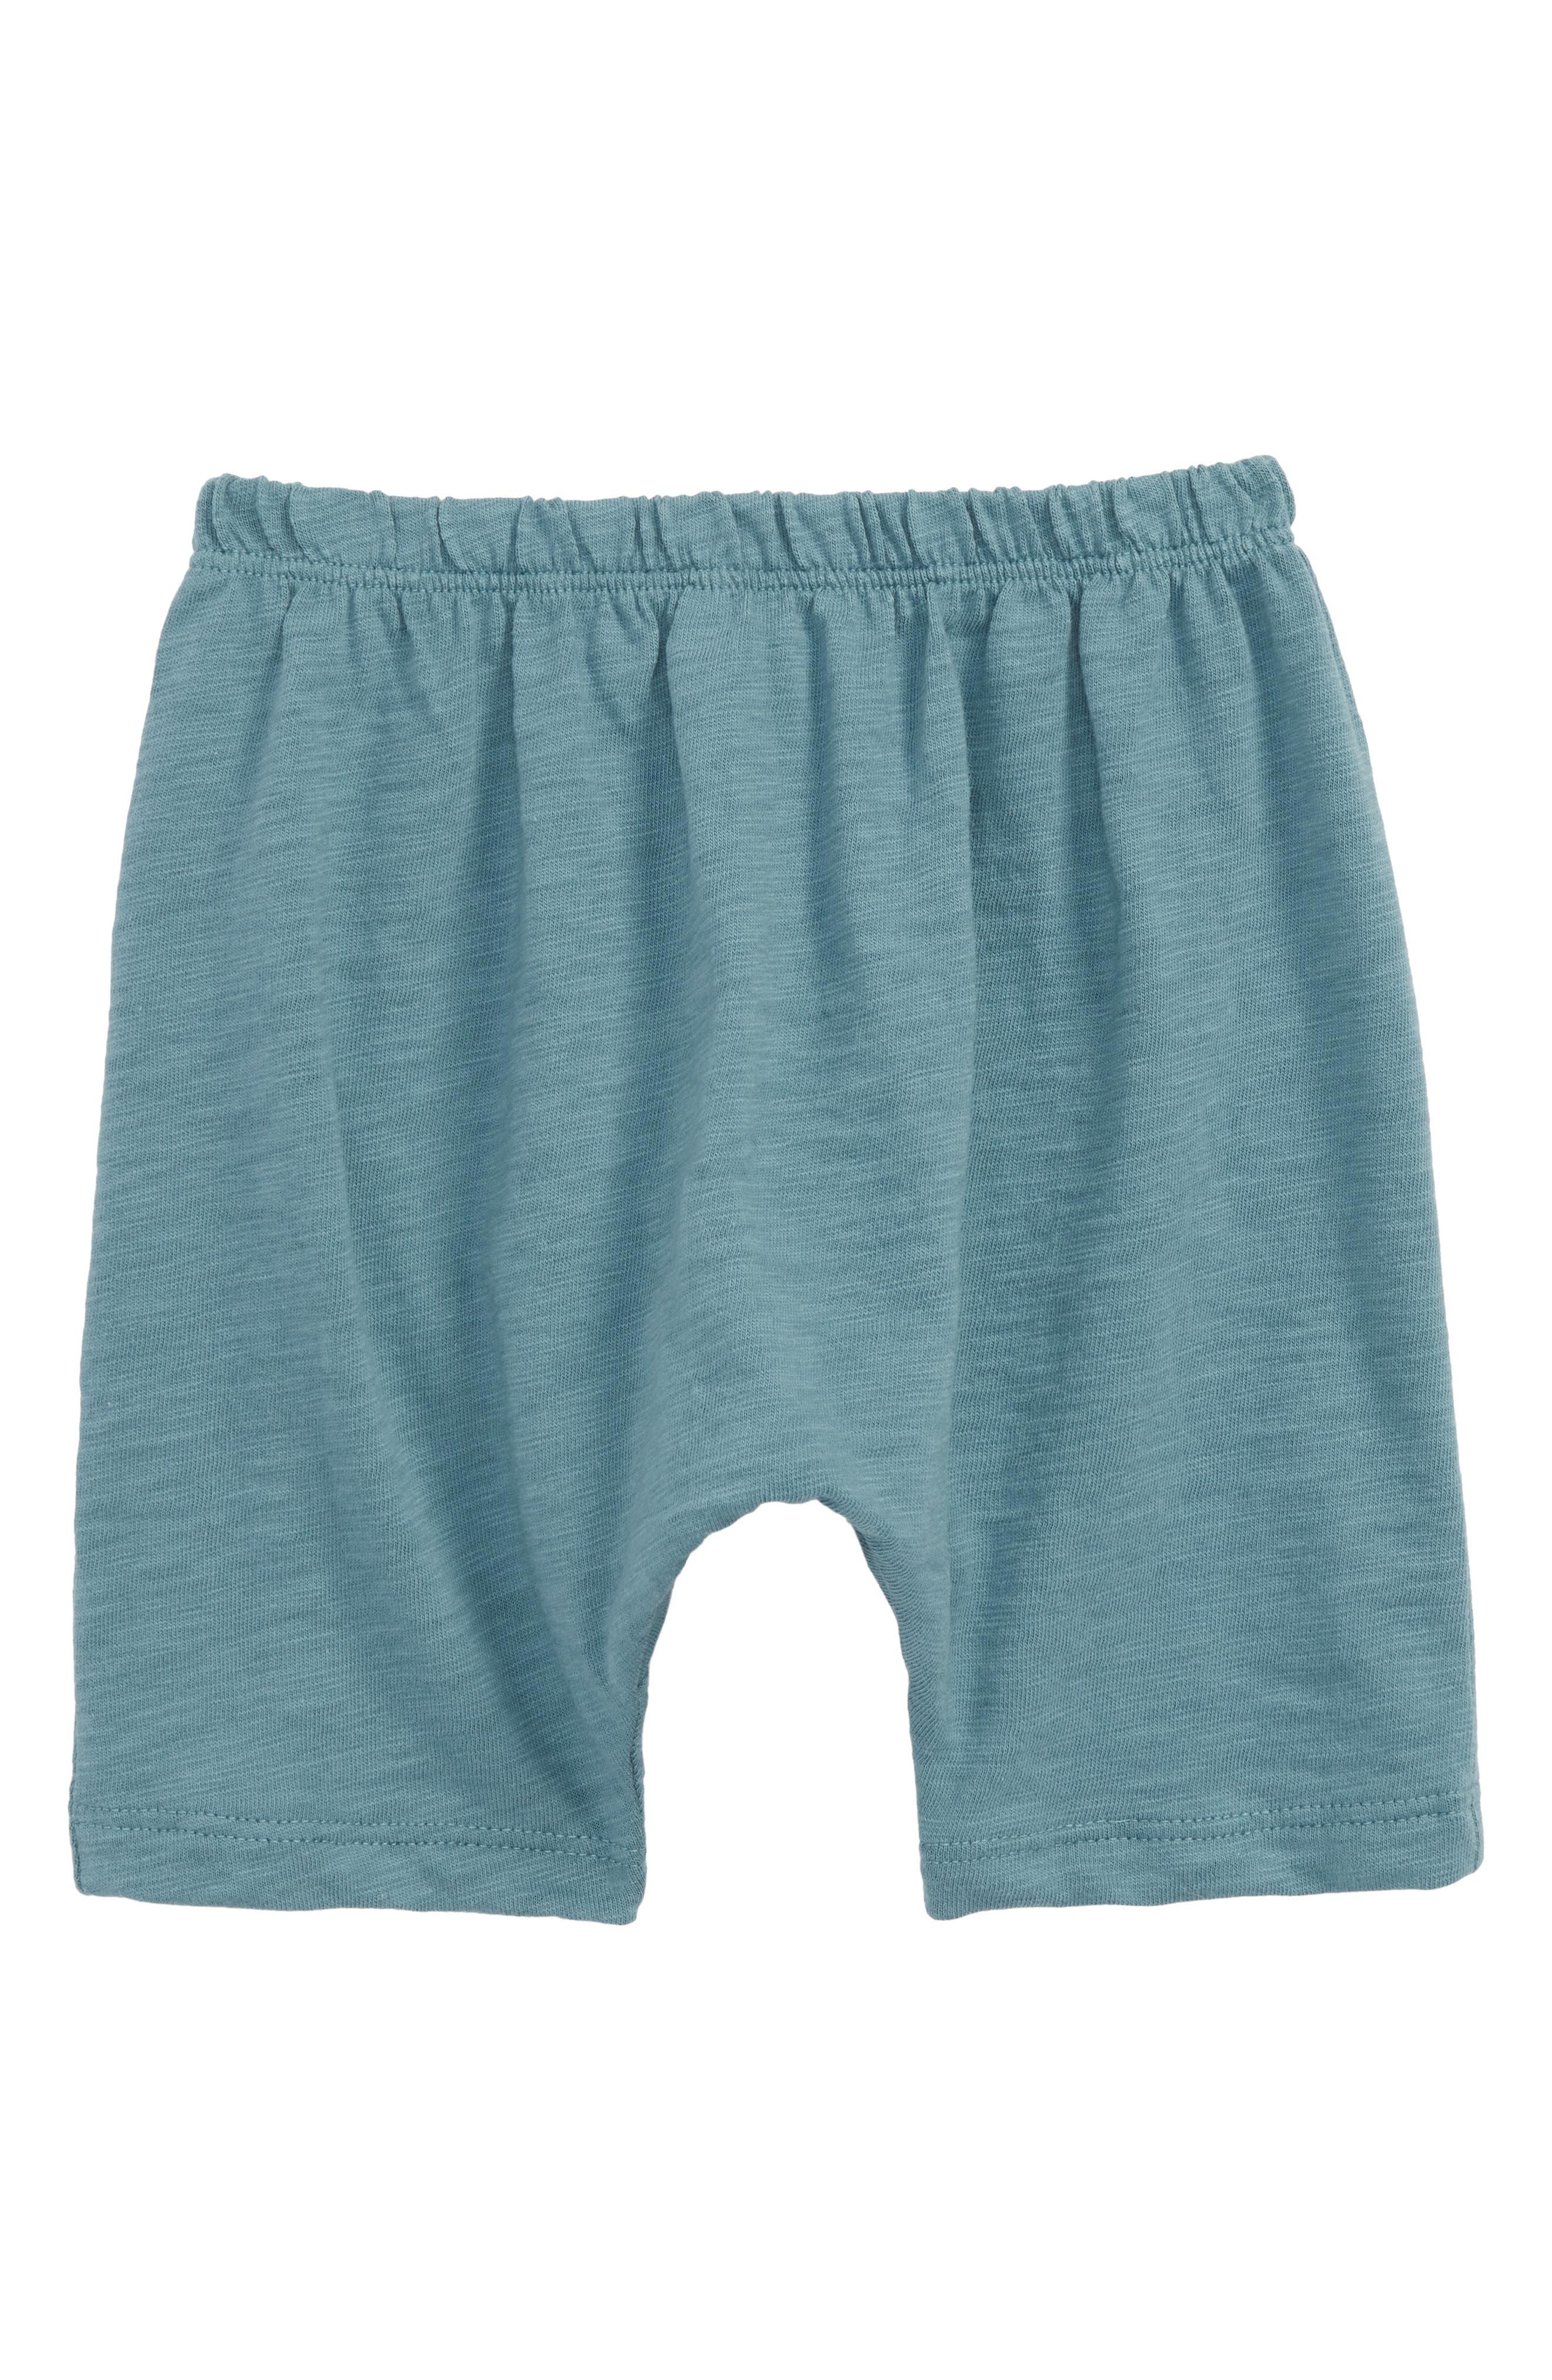 Peek Happy Shorts,                             Main thumbnail 1, color,                             Blue